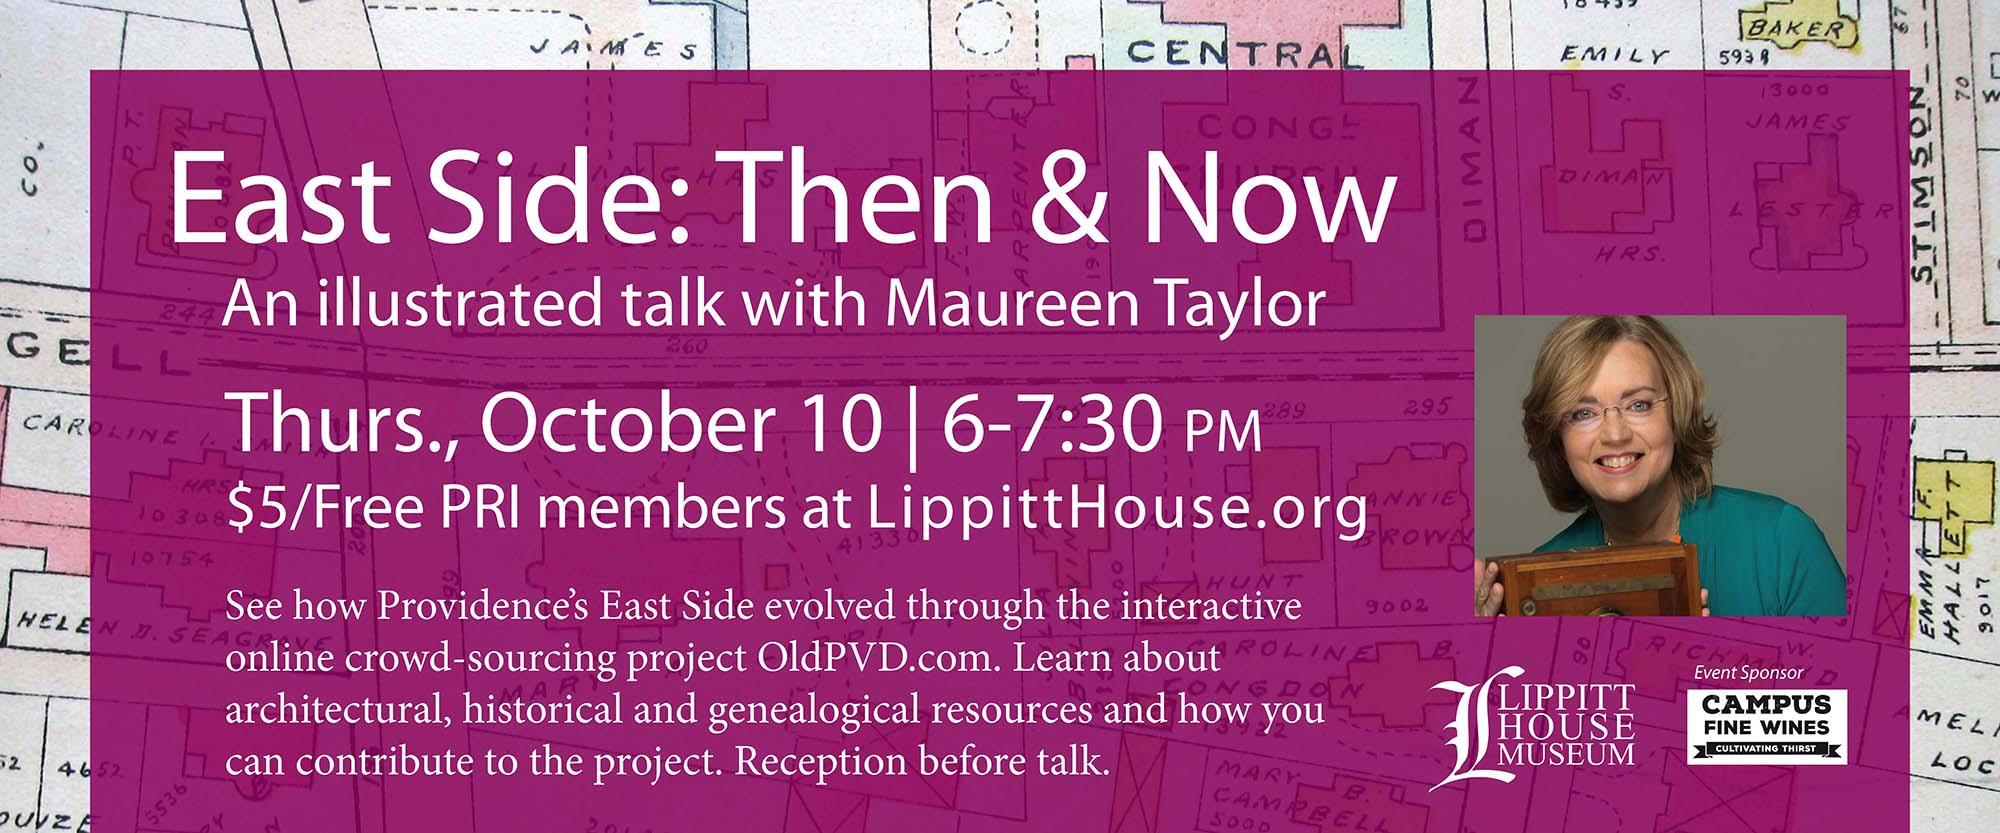 then & now sign DRAFT  - Maureen Taylor.jpg